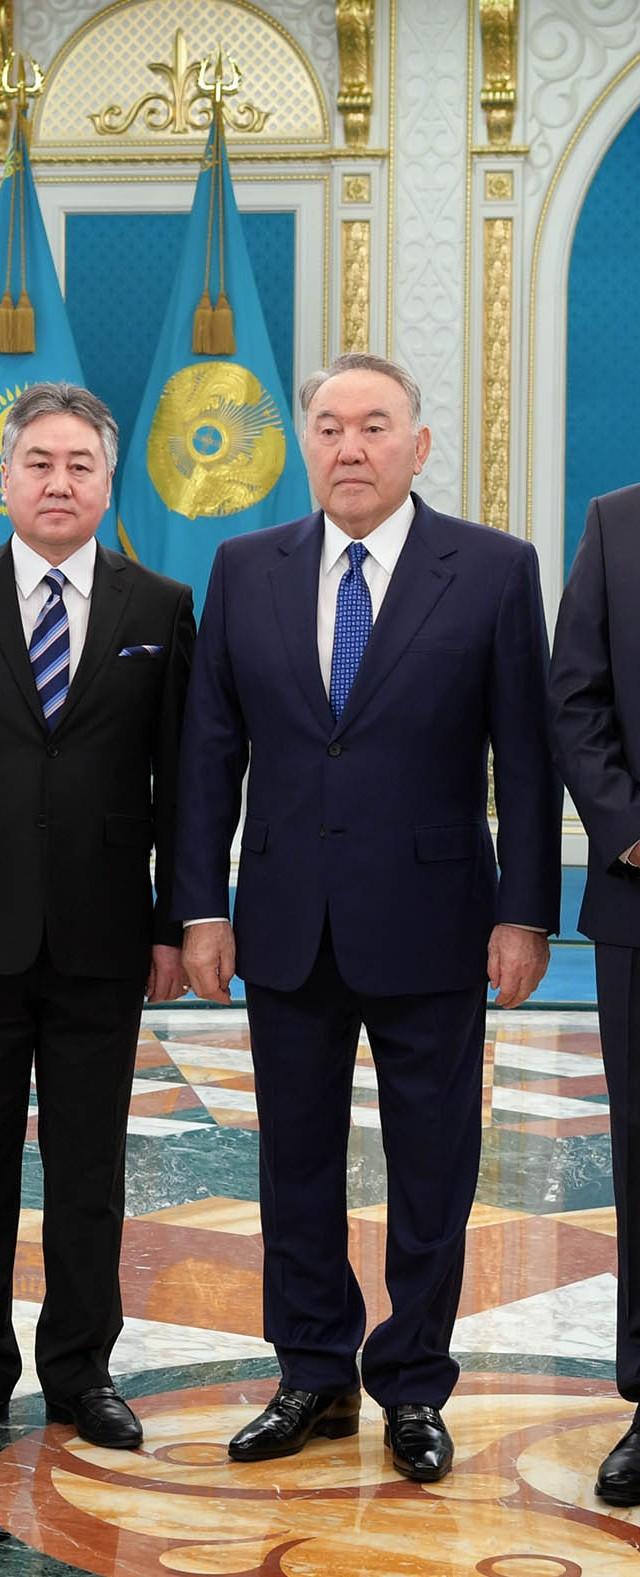 Нурсултан Назарбаев встретился с послами пяти стран - Mail.ru Новости c2cba0f3836